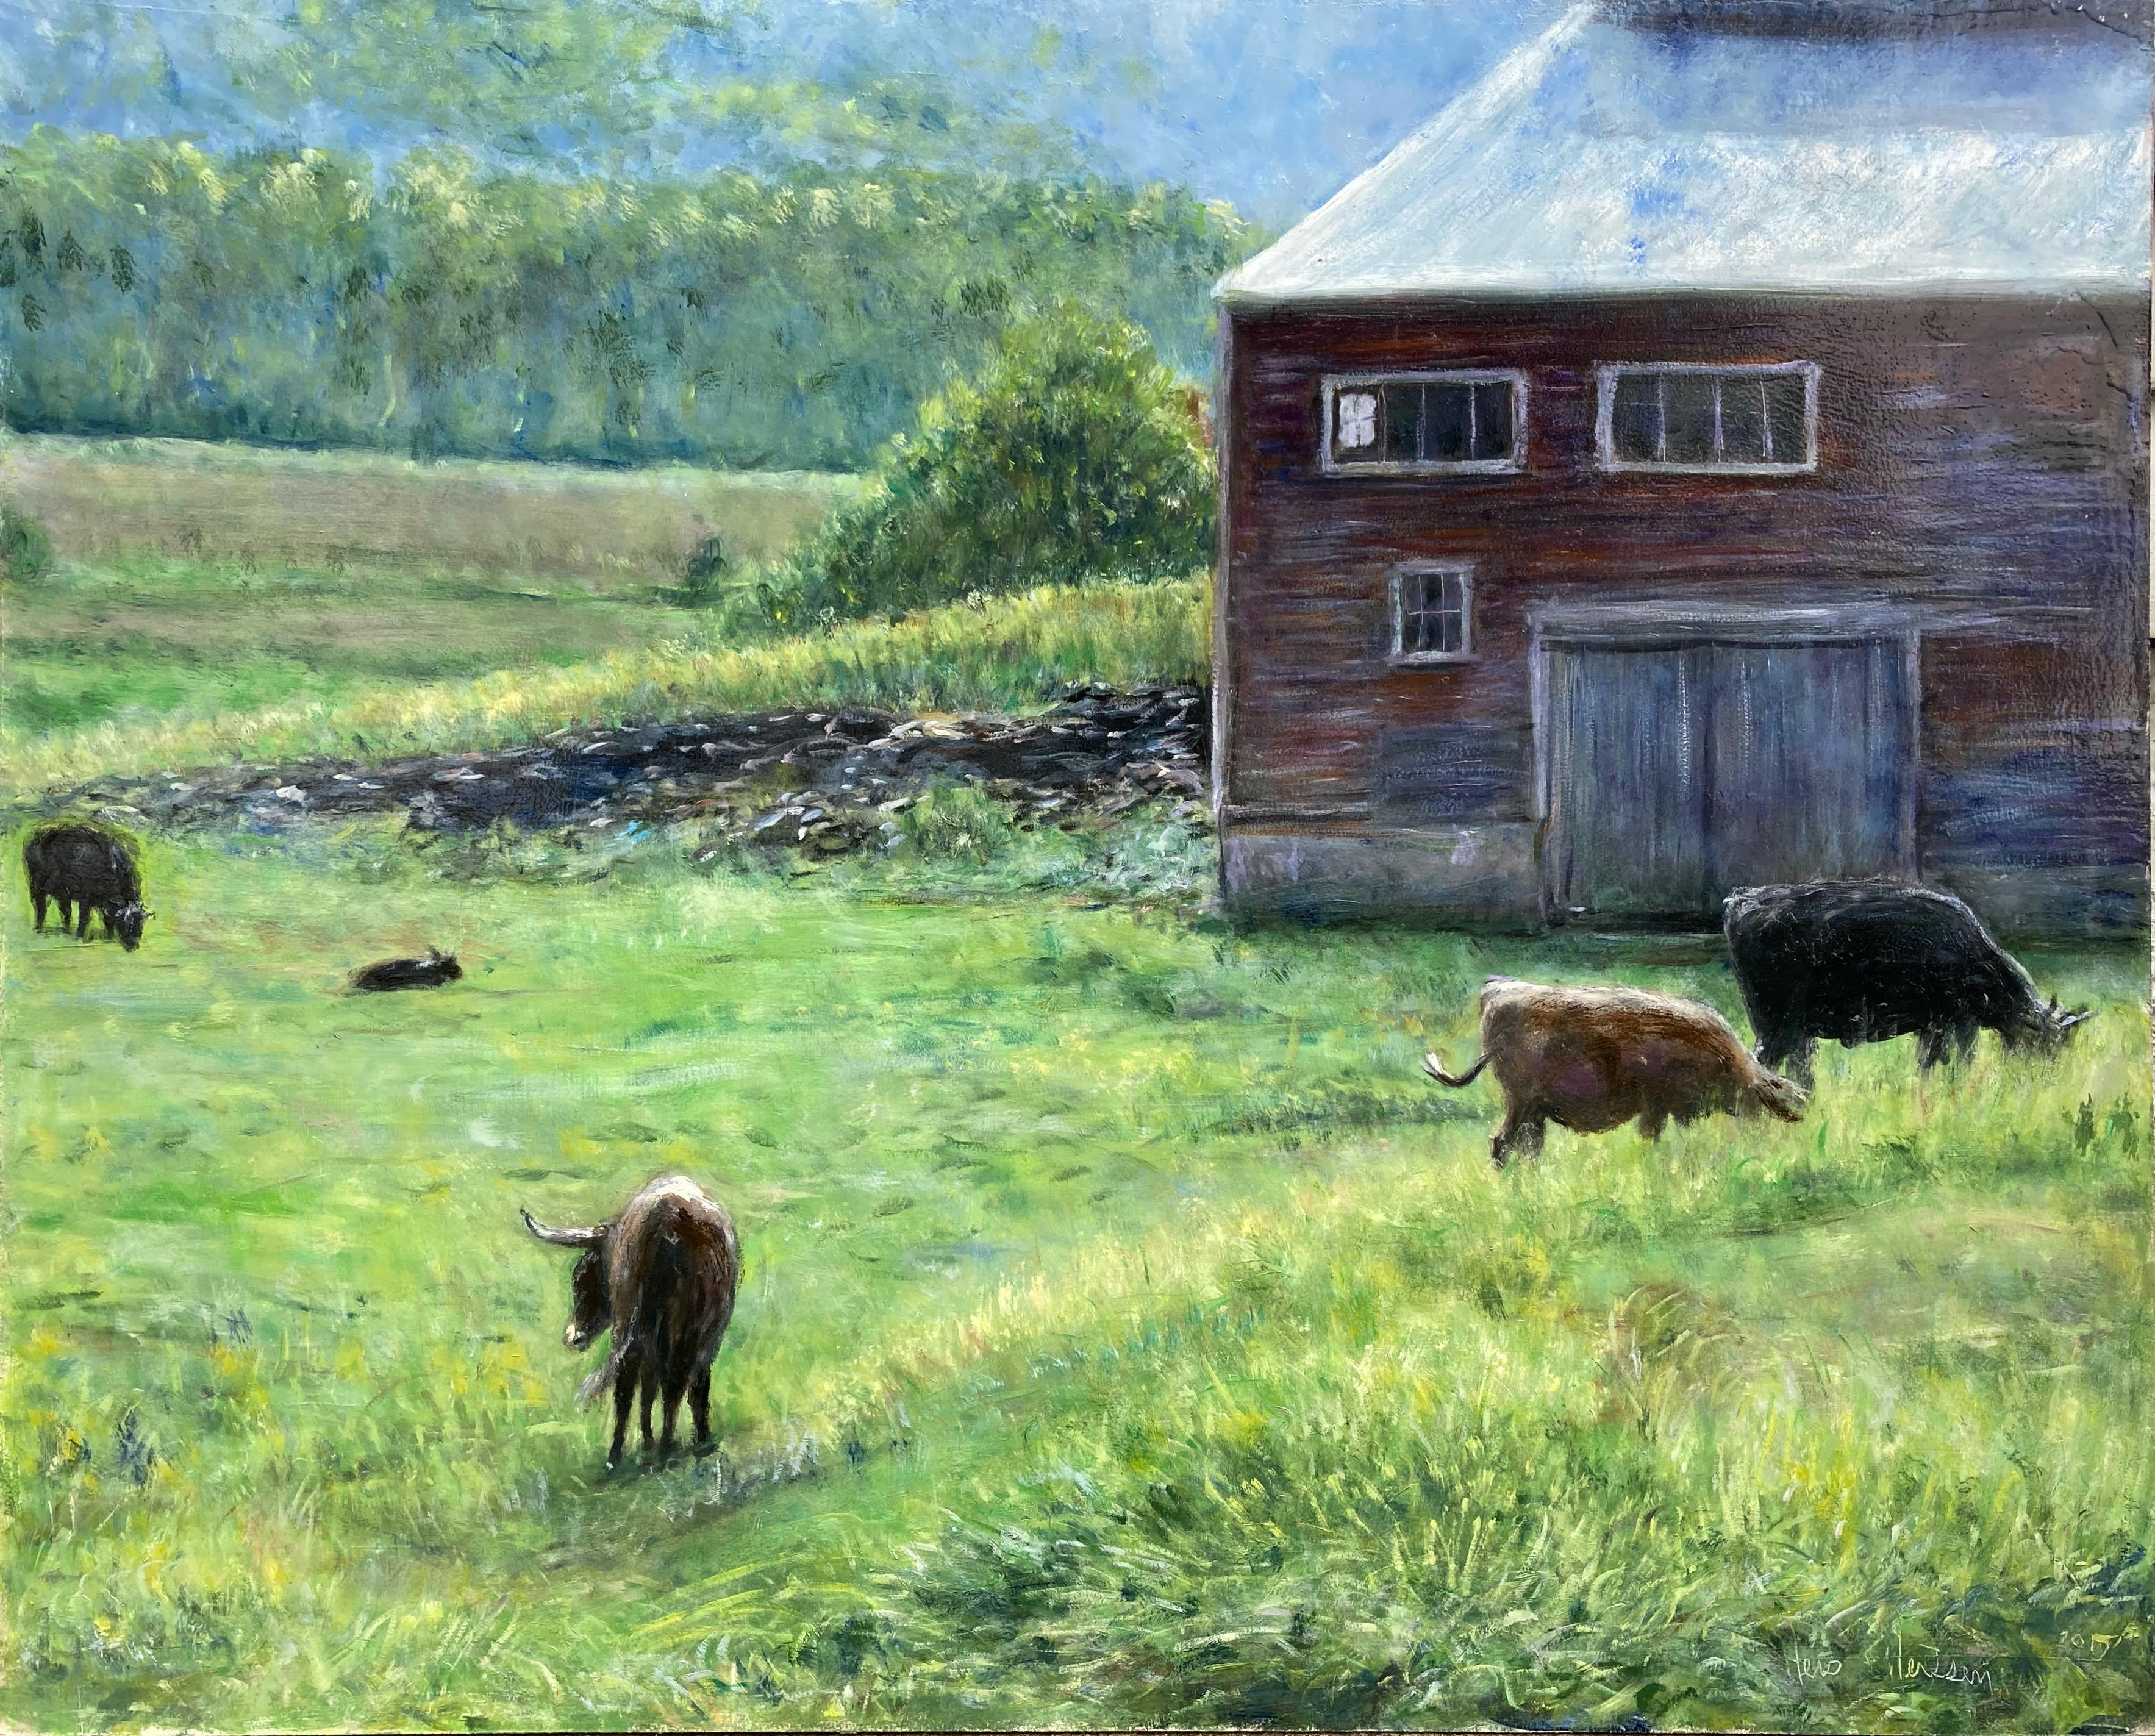 Farm on Route 5, Vermont